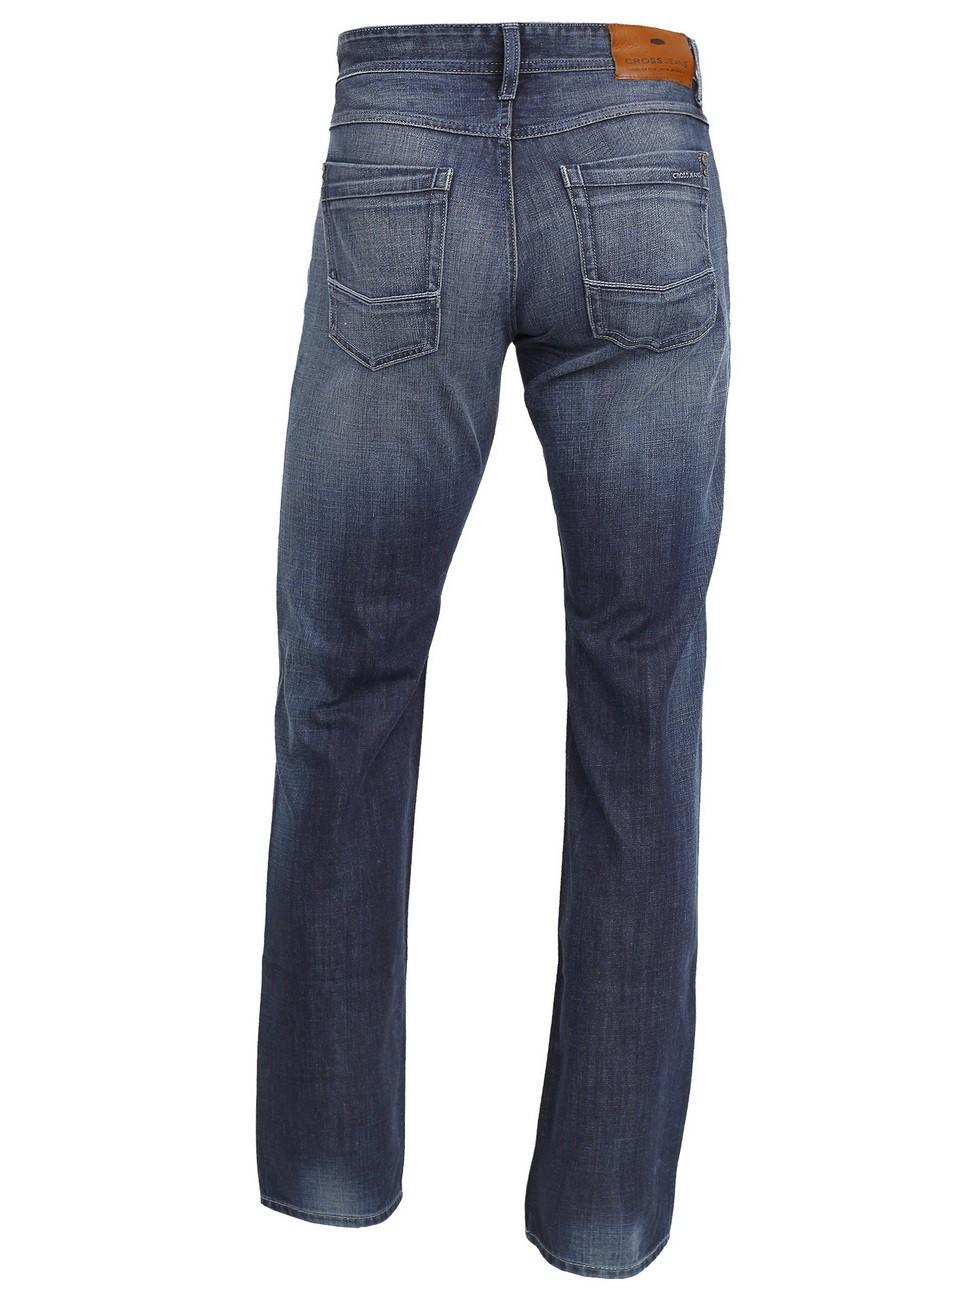 cross herren jeans antonio relax fit true dark blue used kaufen jeans direct de. Black Bedroom Furniture Sets. Home Design Ideas